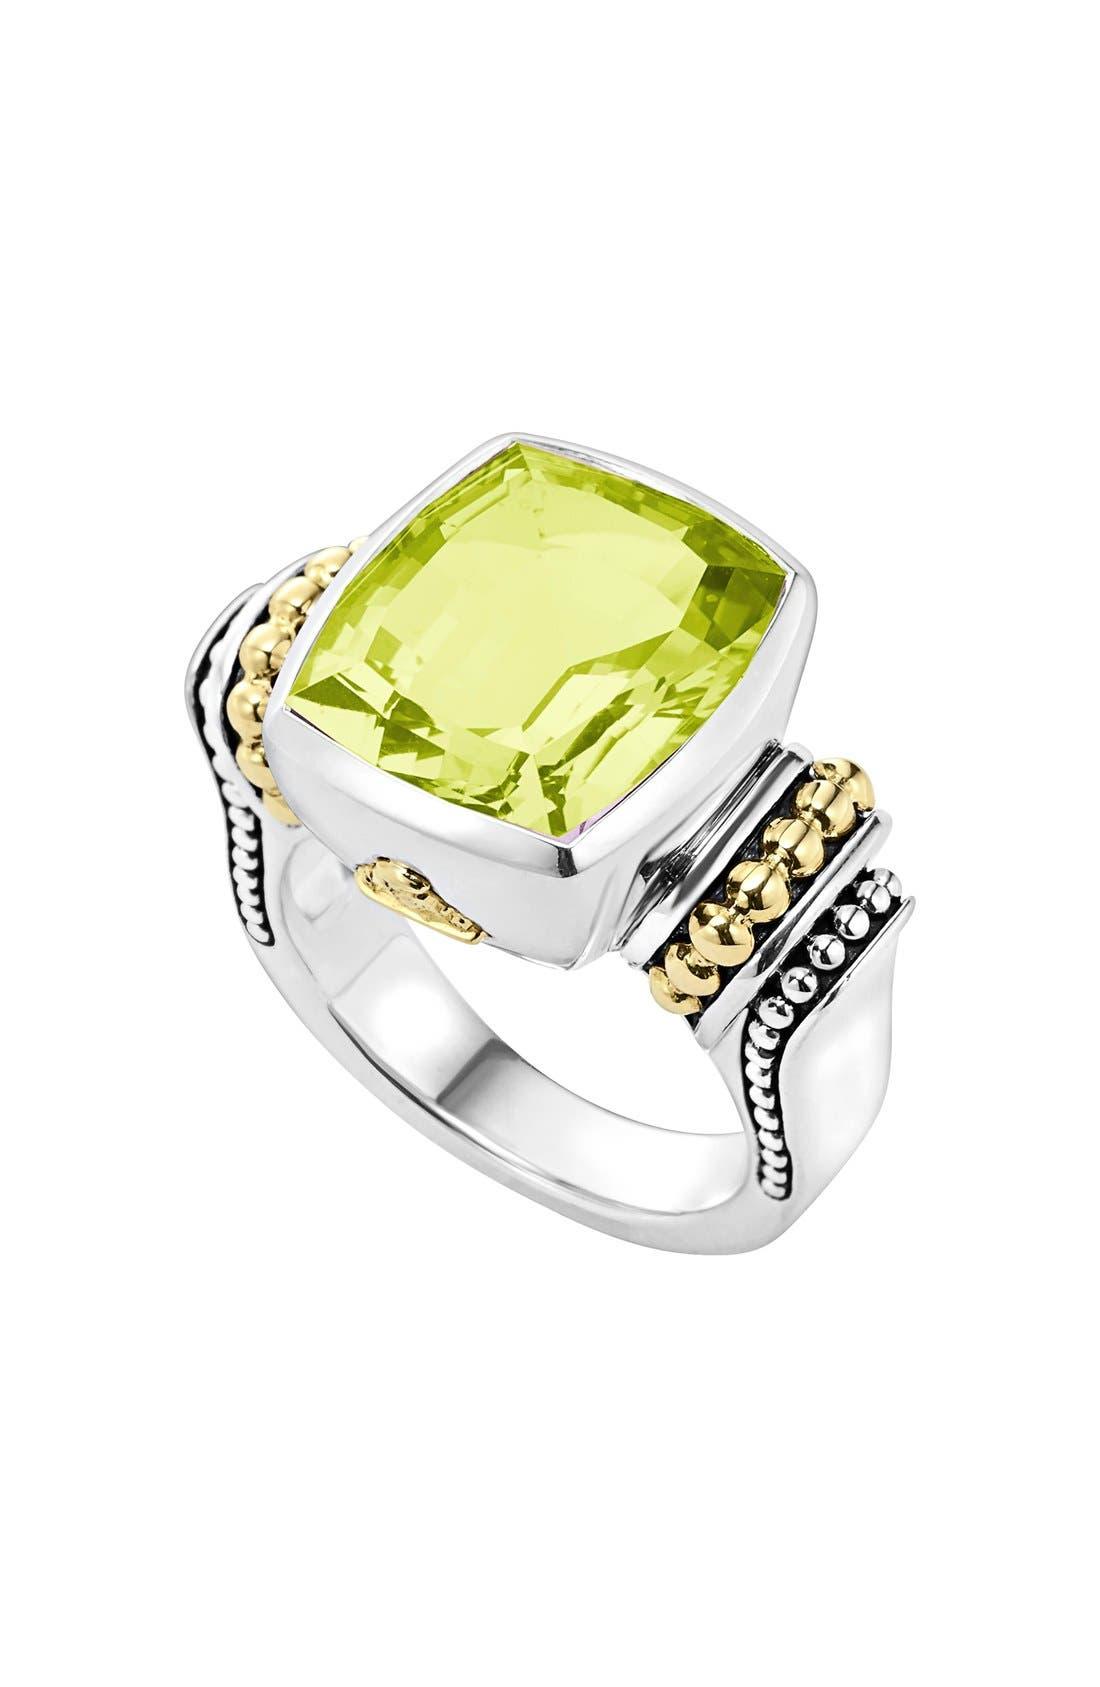 LAGOS Caviar Color Medium Semiprecious Stone Ring